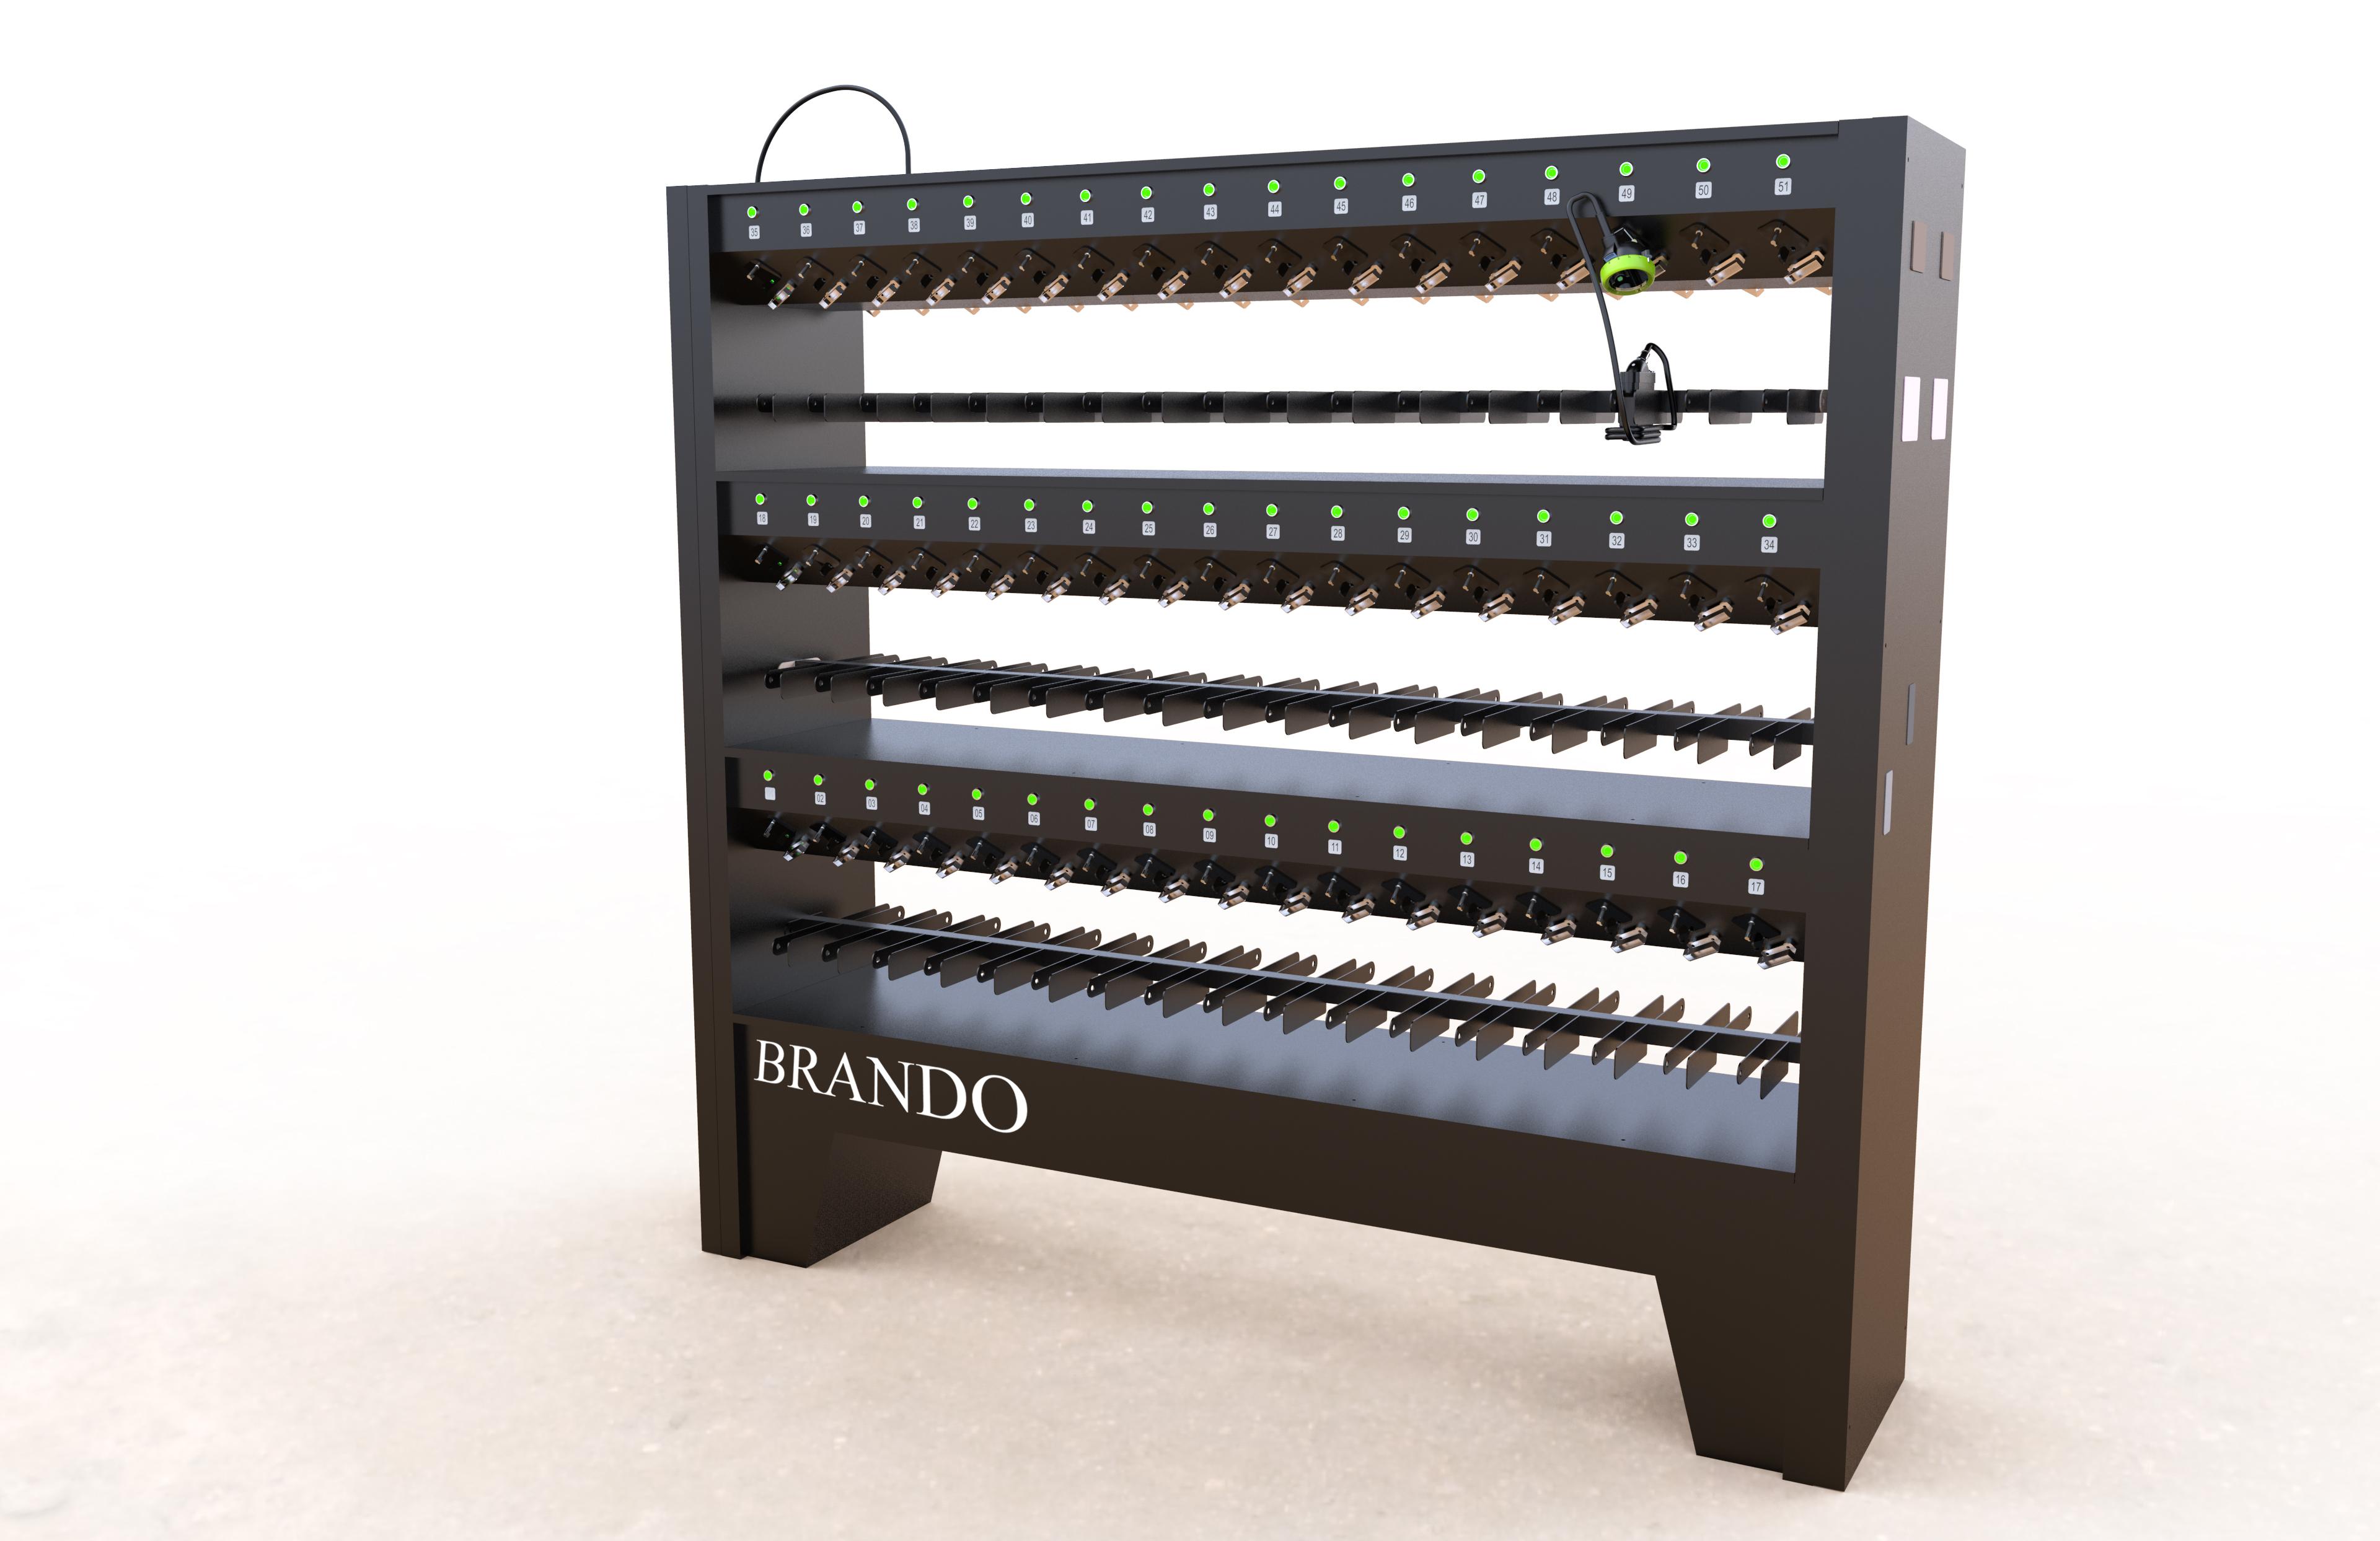 BRANDO new 102 units charger racks